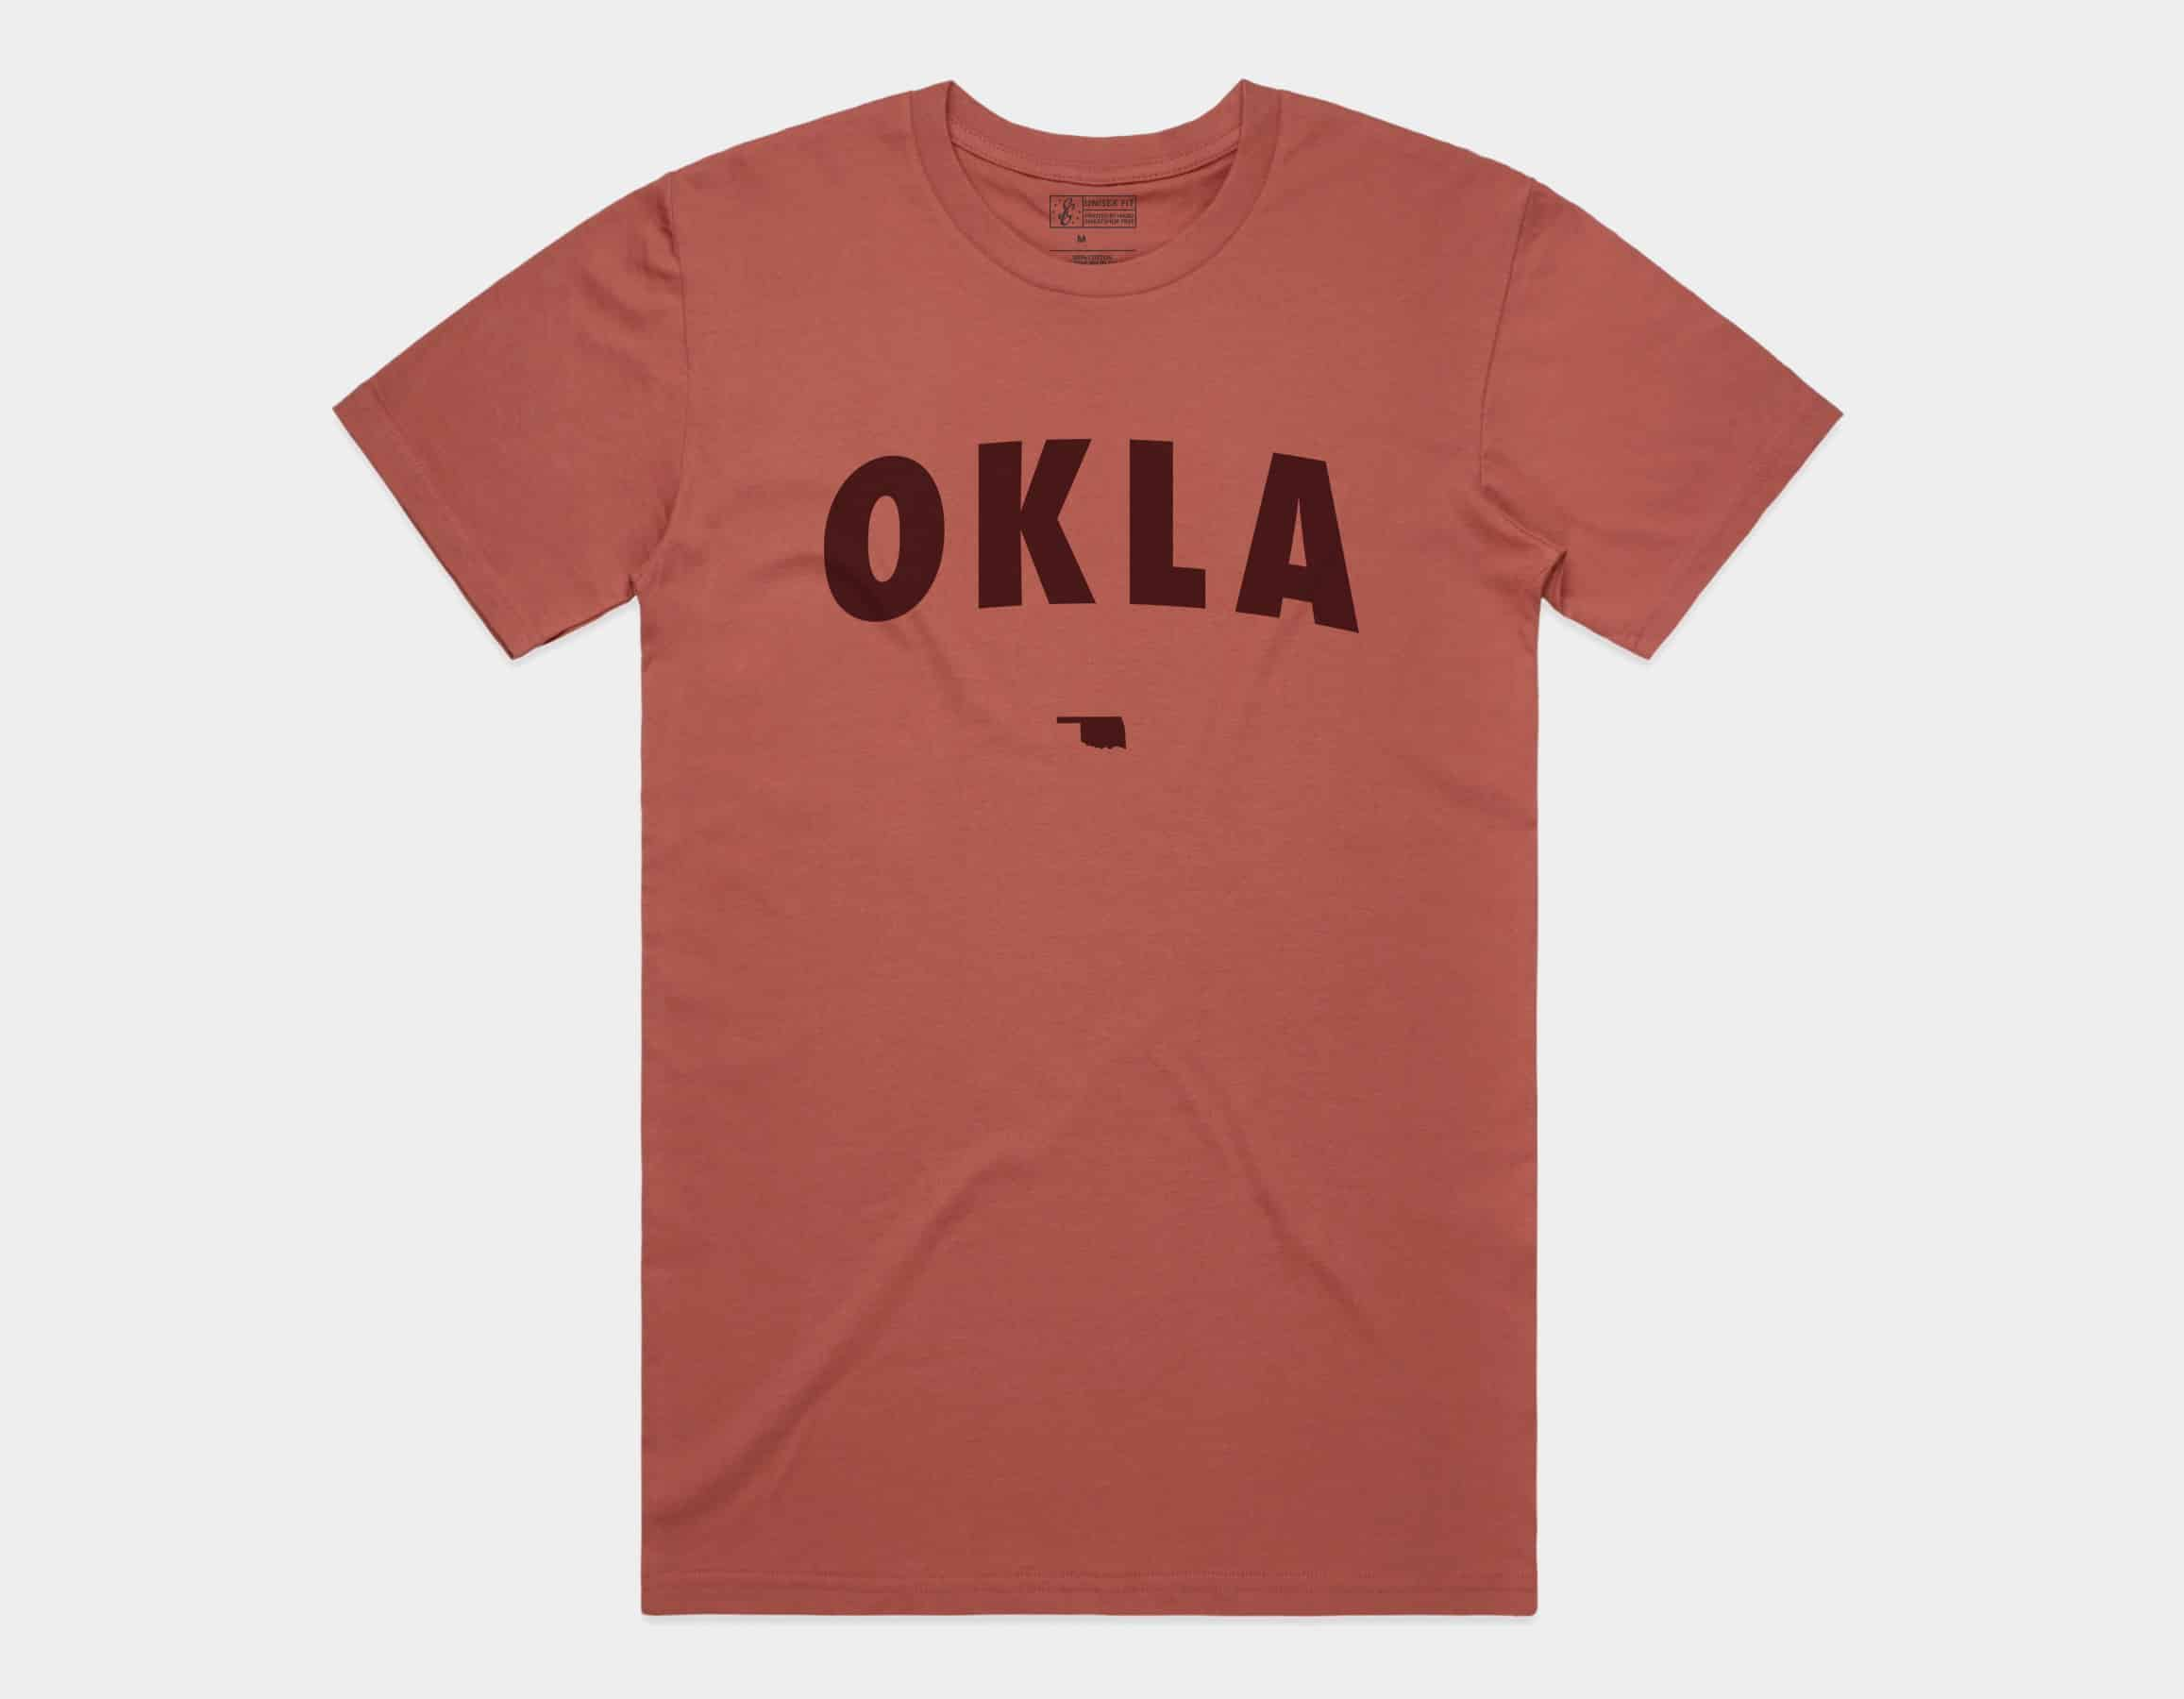 OKLA Tee Coral